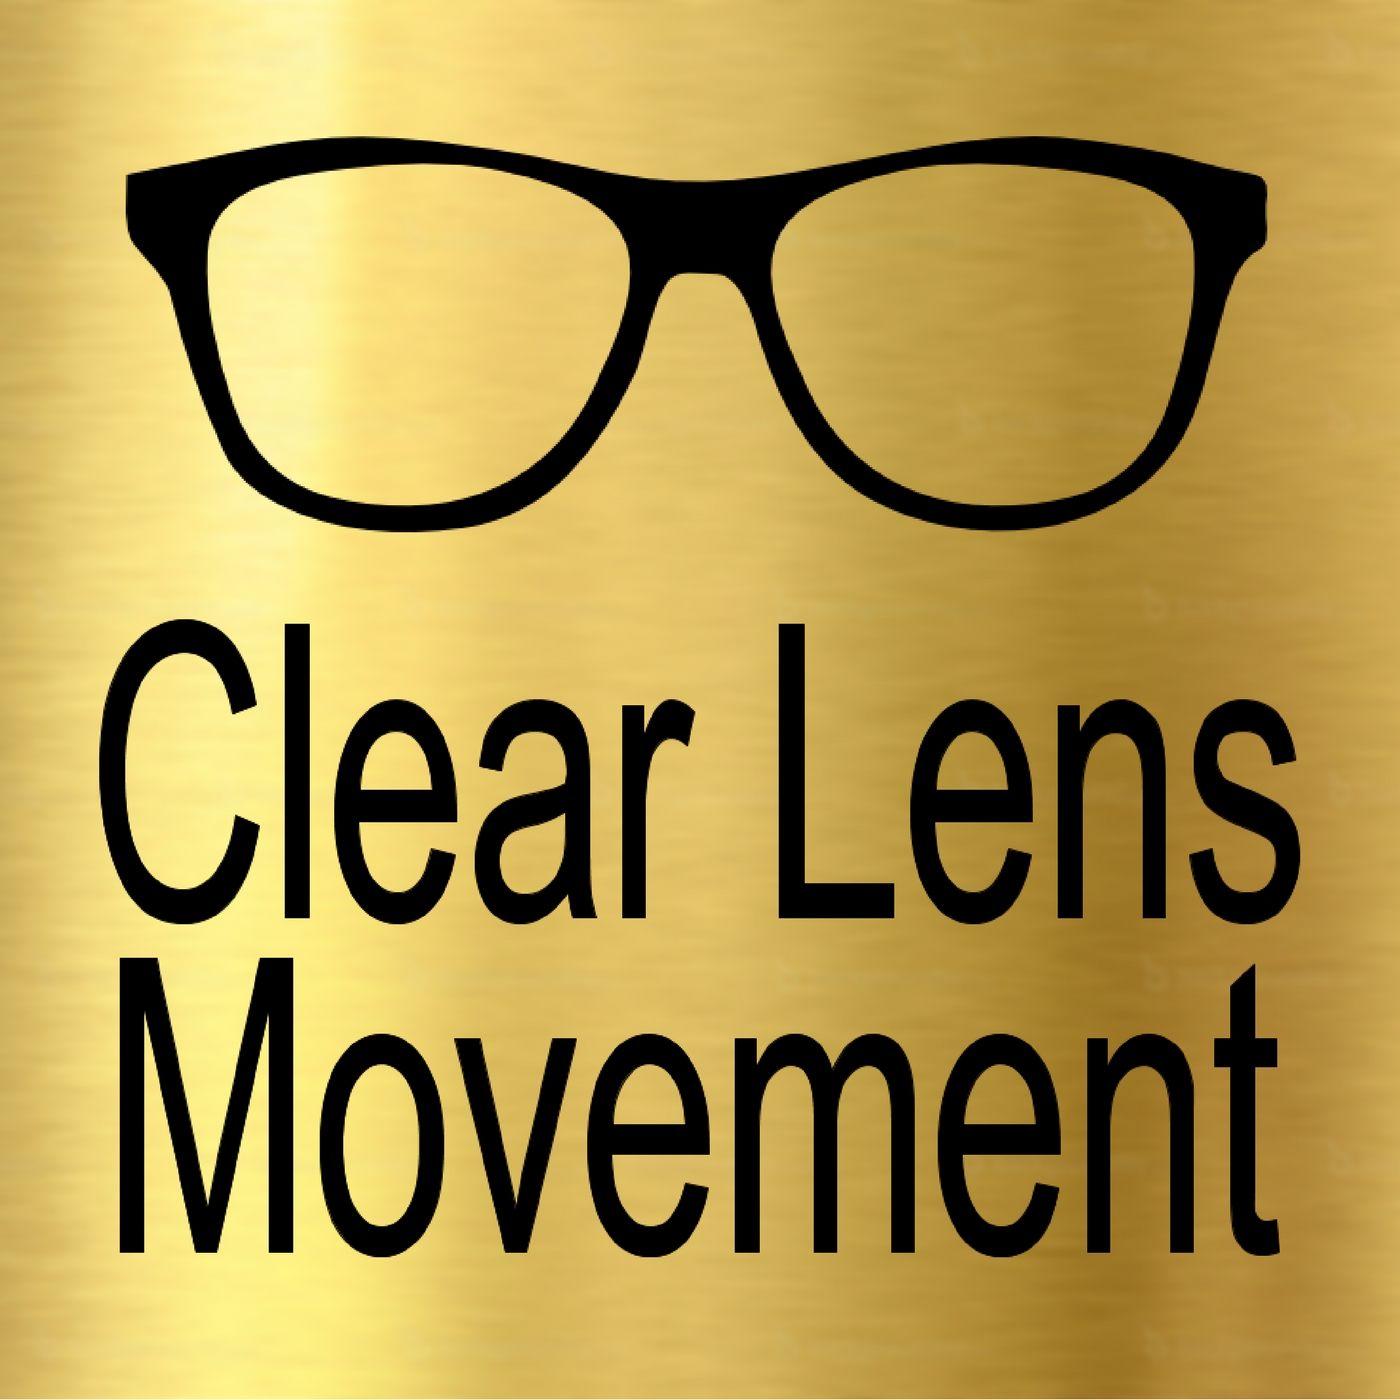 c7e32b3eb15 Clear Lens Movement: Health and Wellness, Emotional Intelligence ...